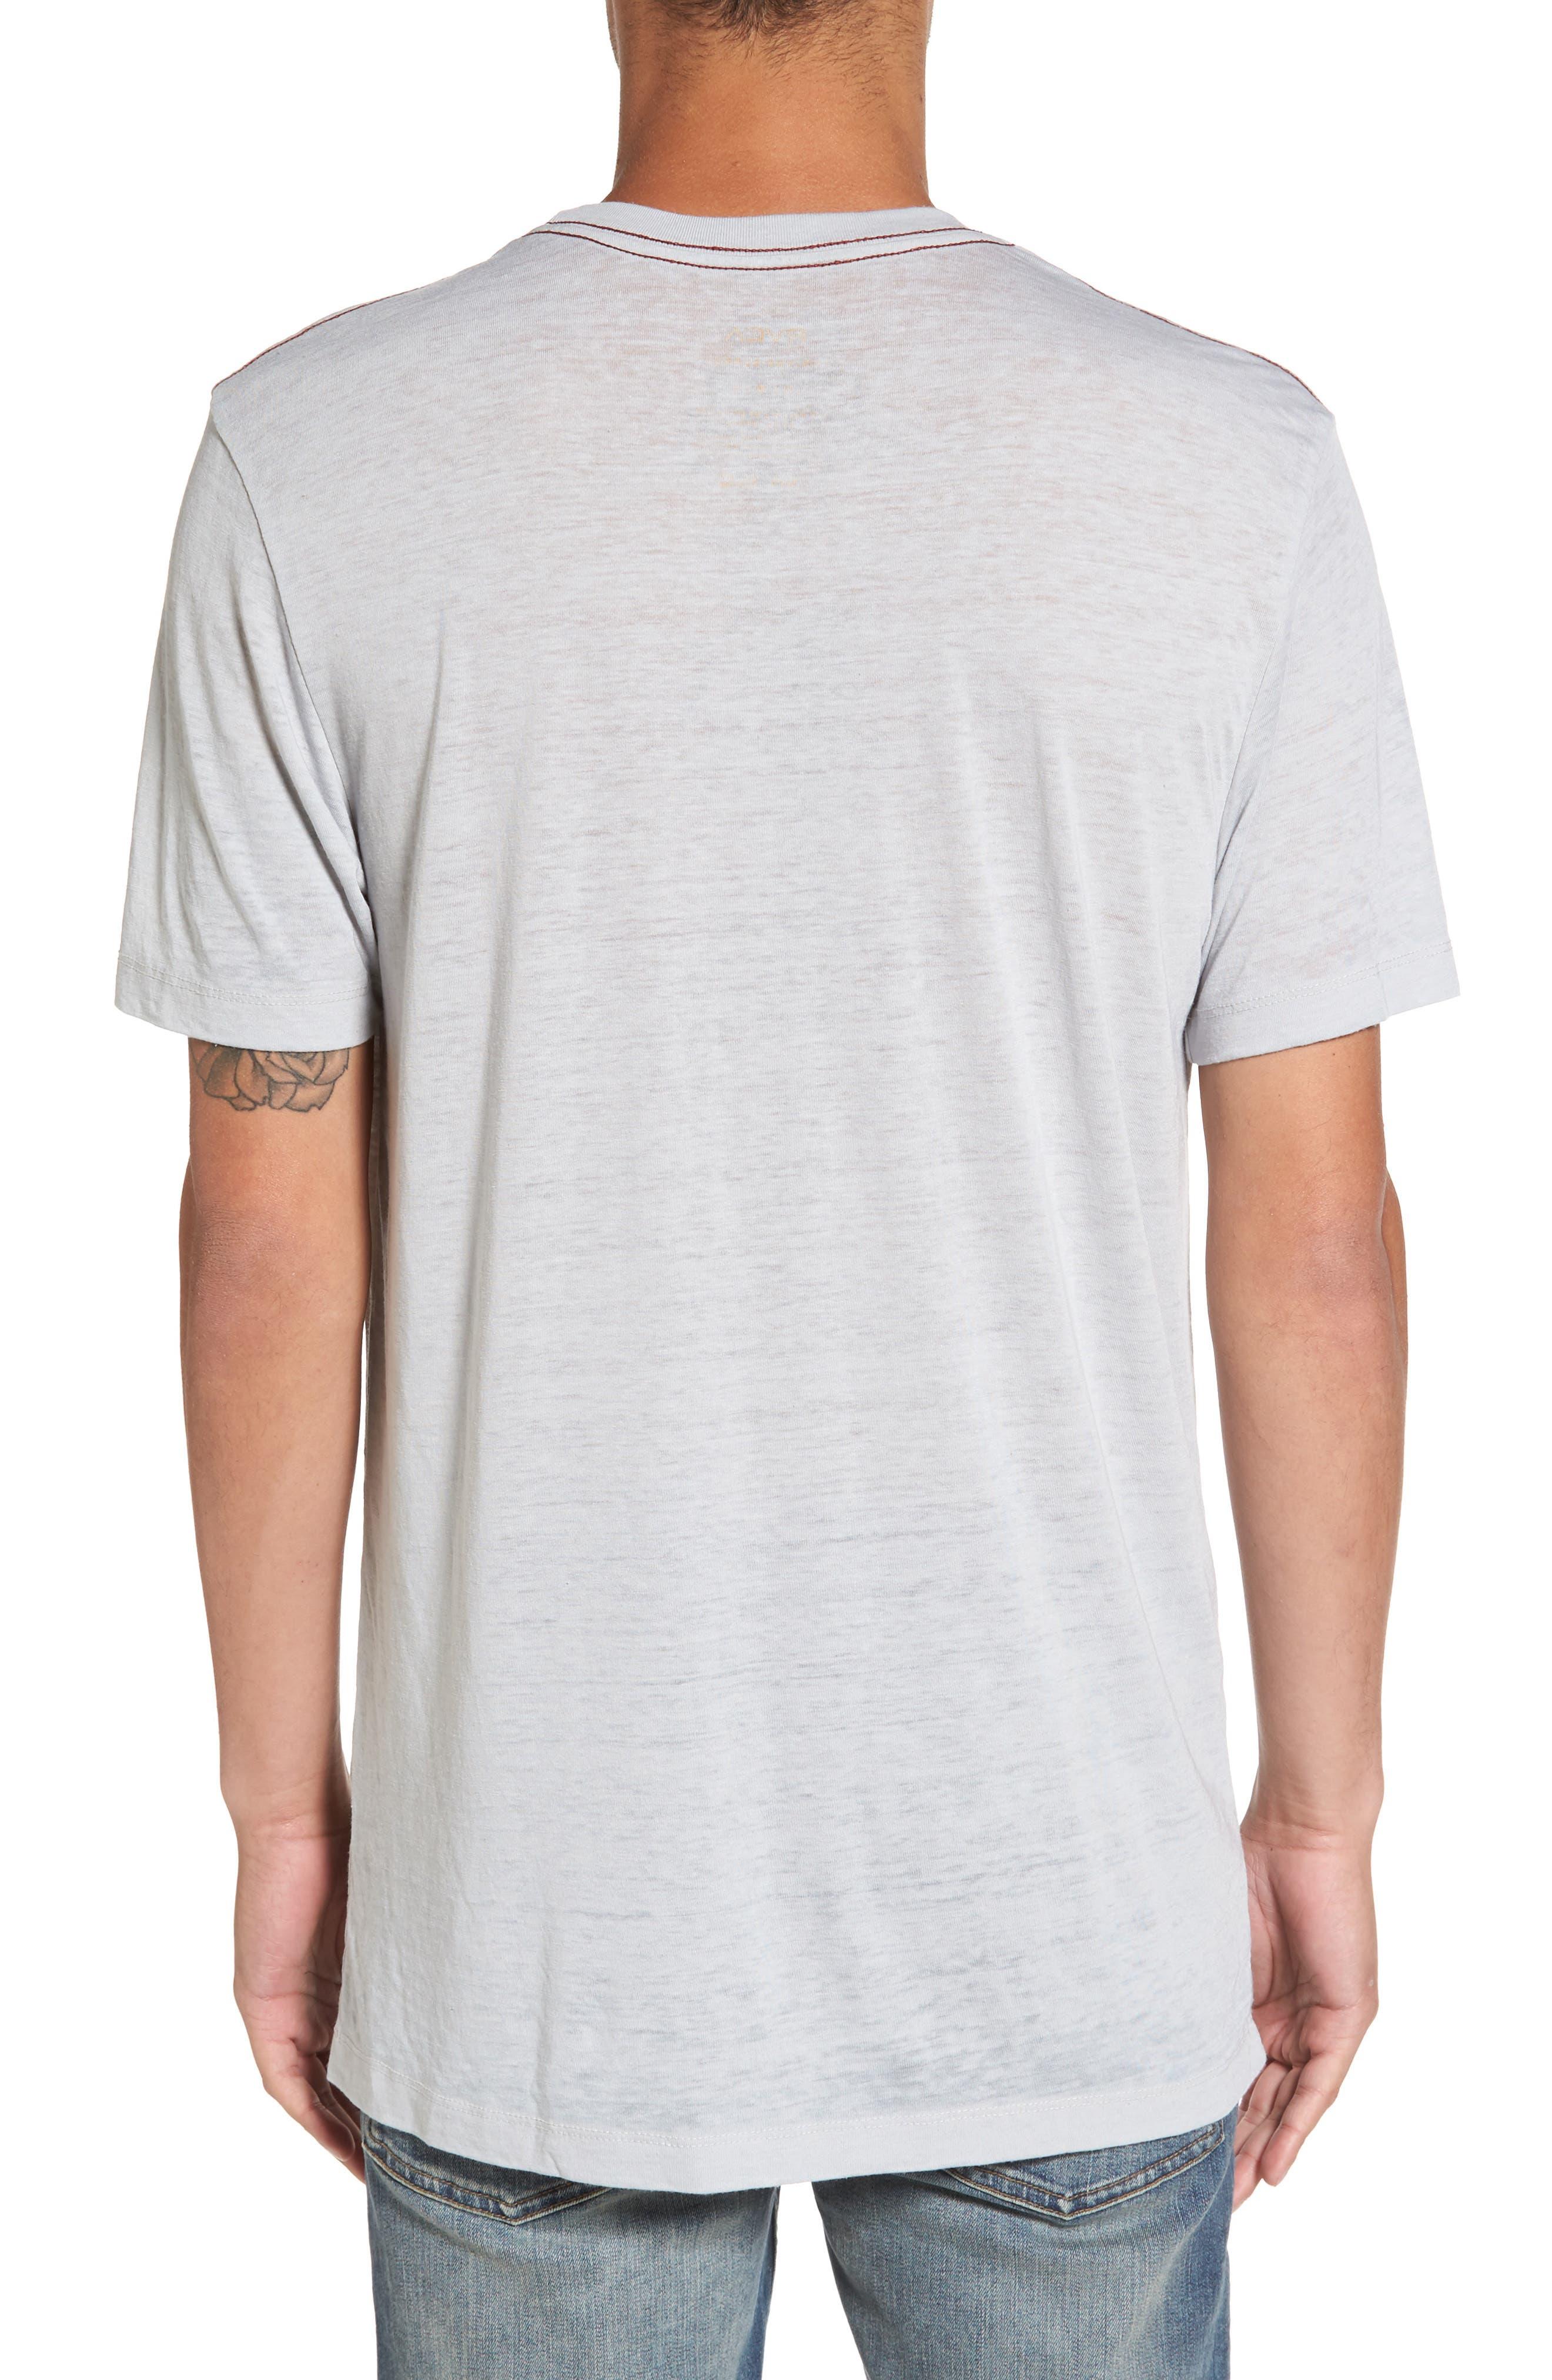 Balance Process T-Shirt,                             Alternate thumbnail 7, color,